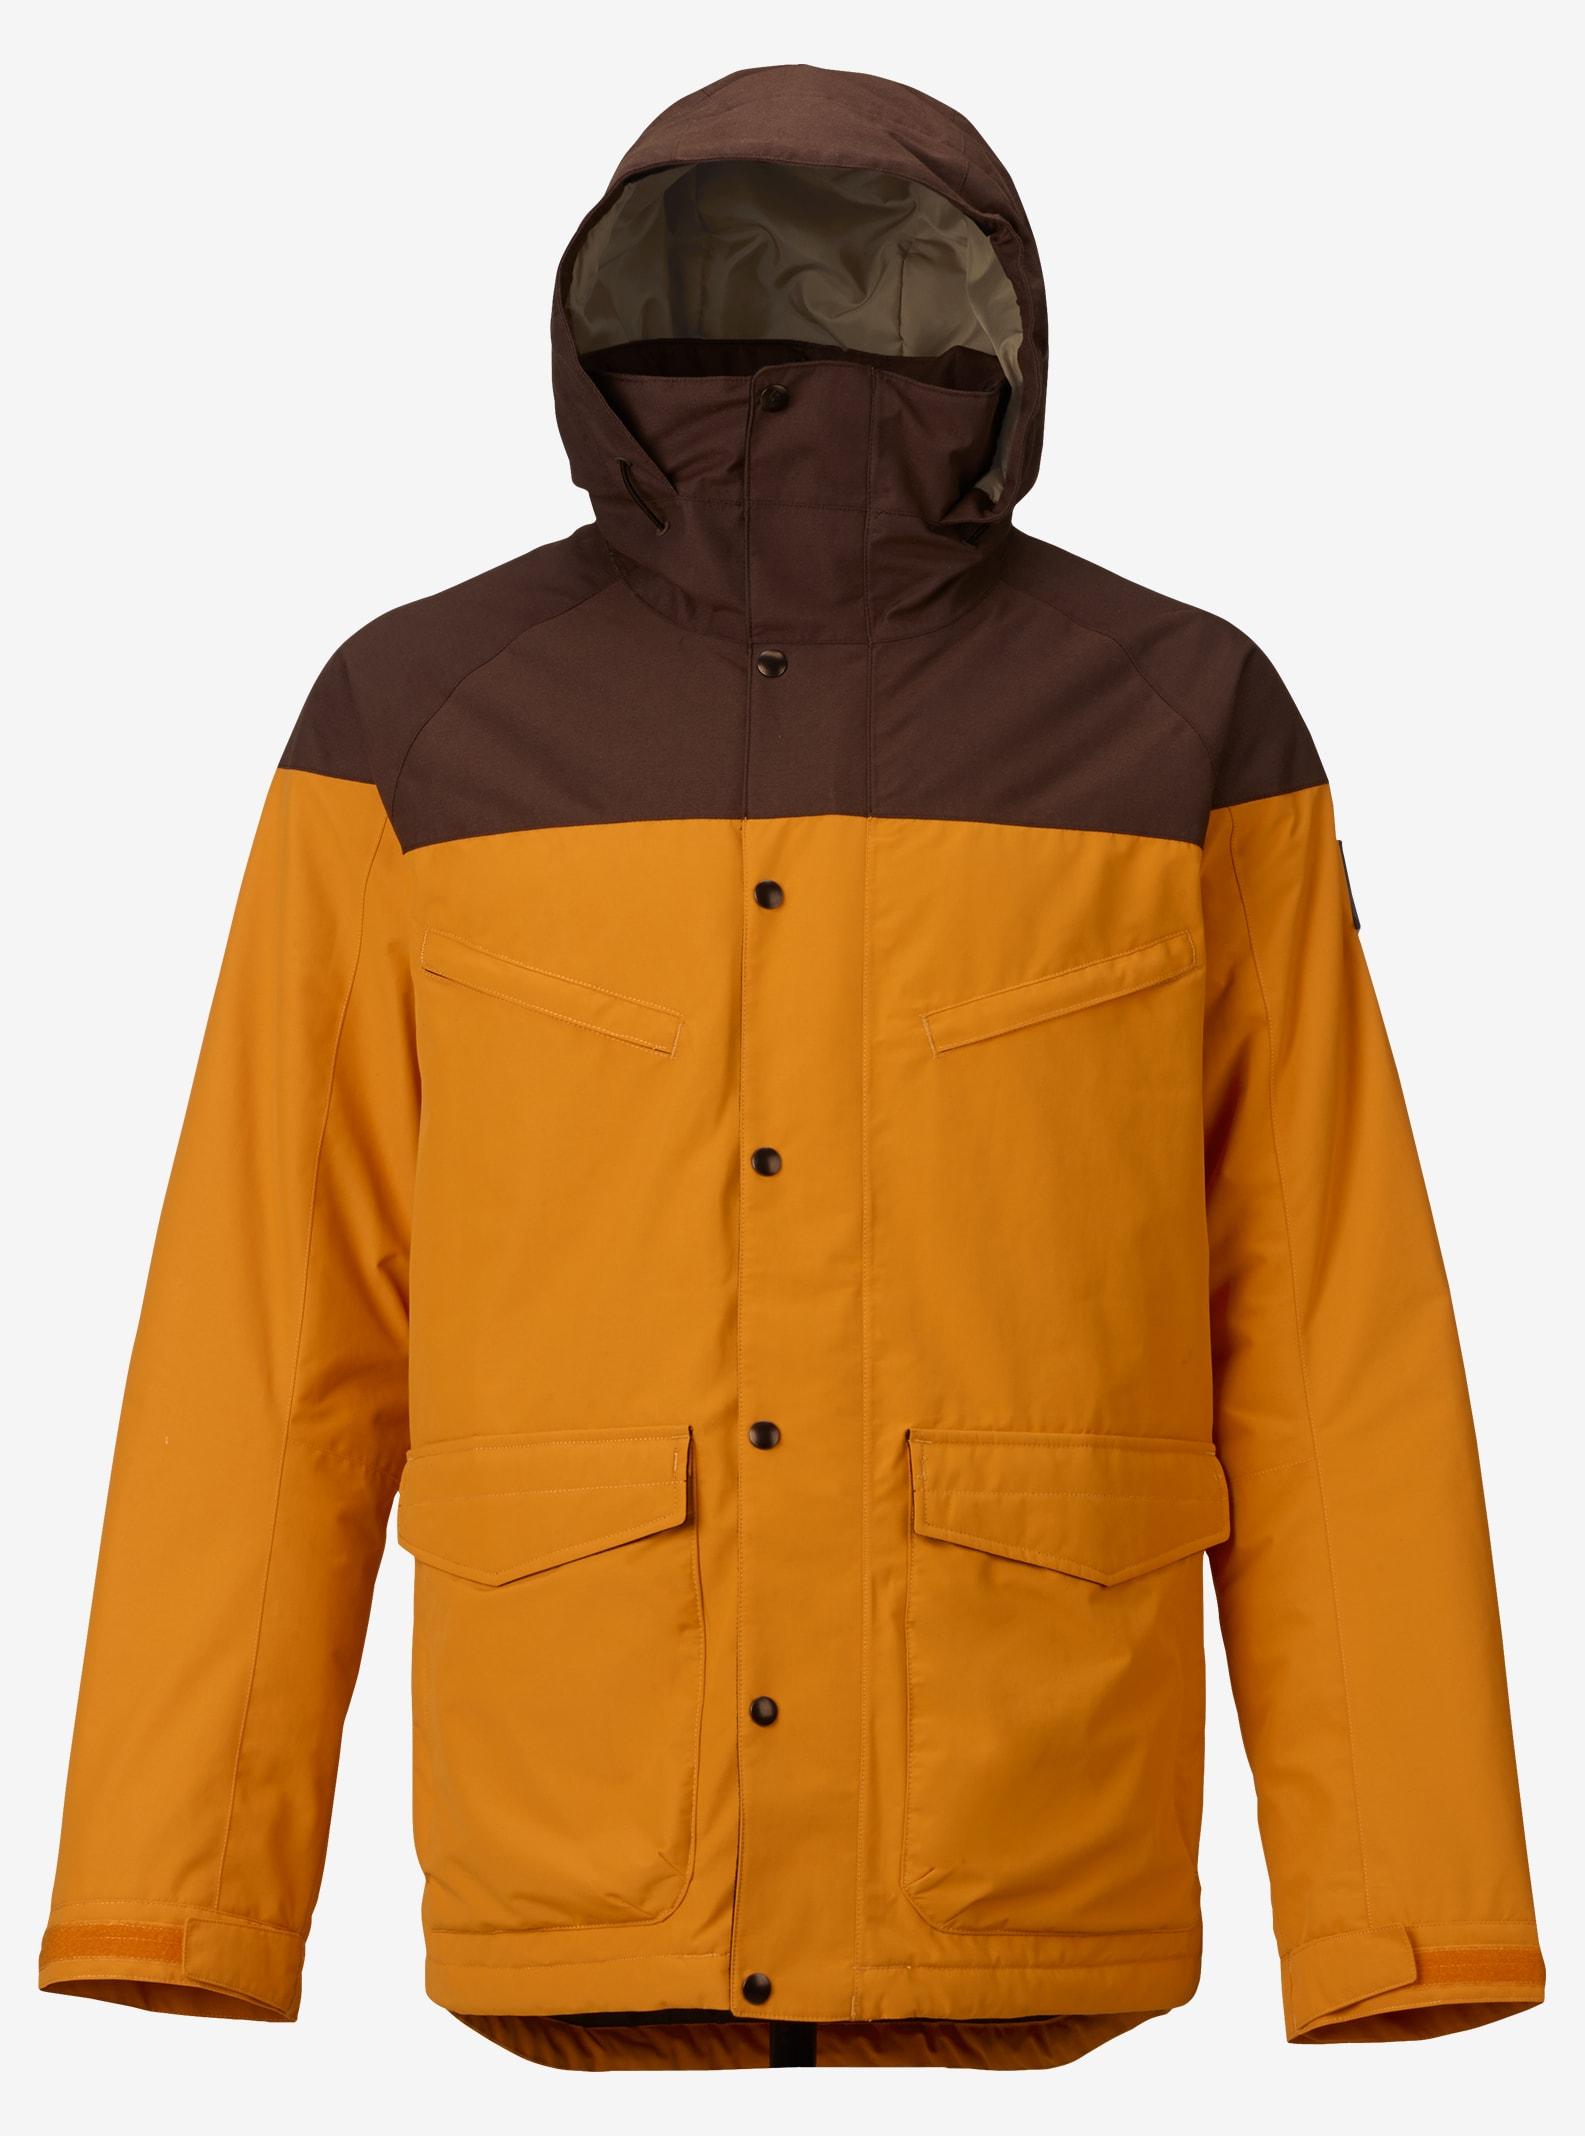 Men's Burton Breach Jacket shown in Golden Oak / Chestnut